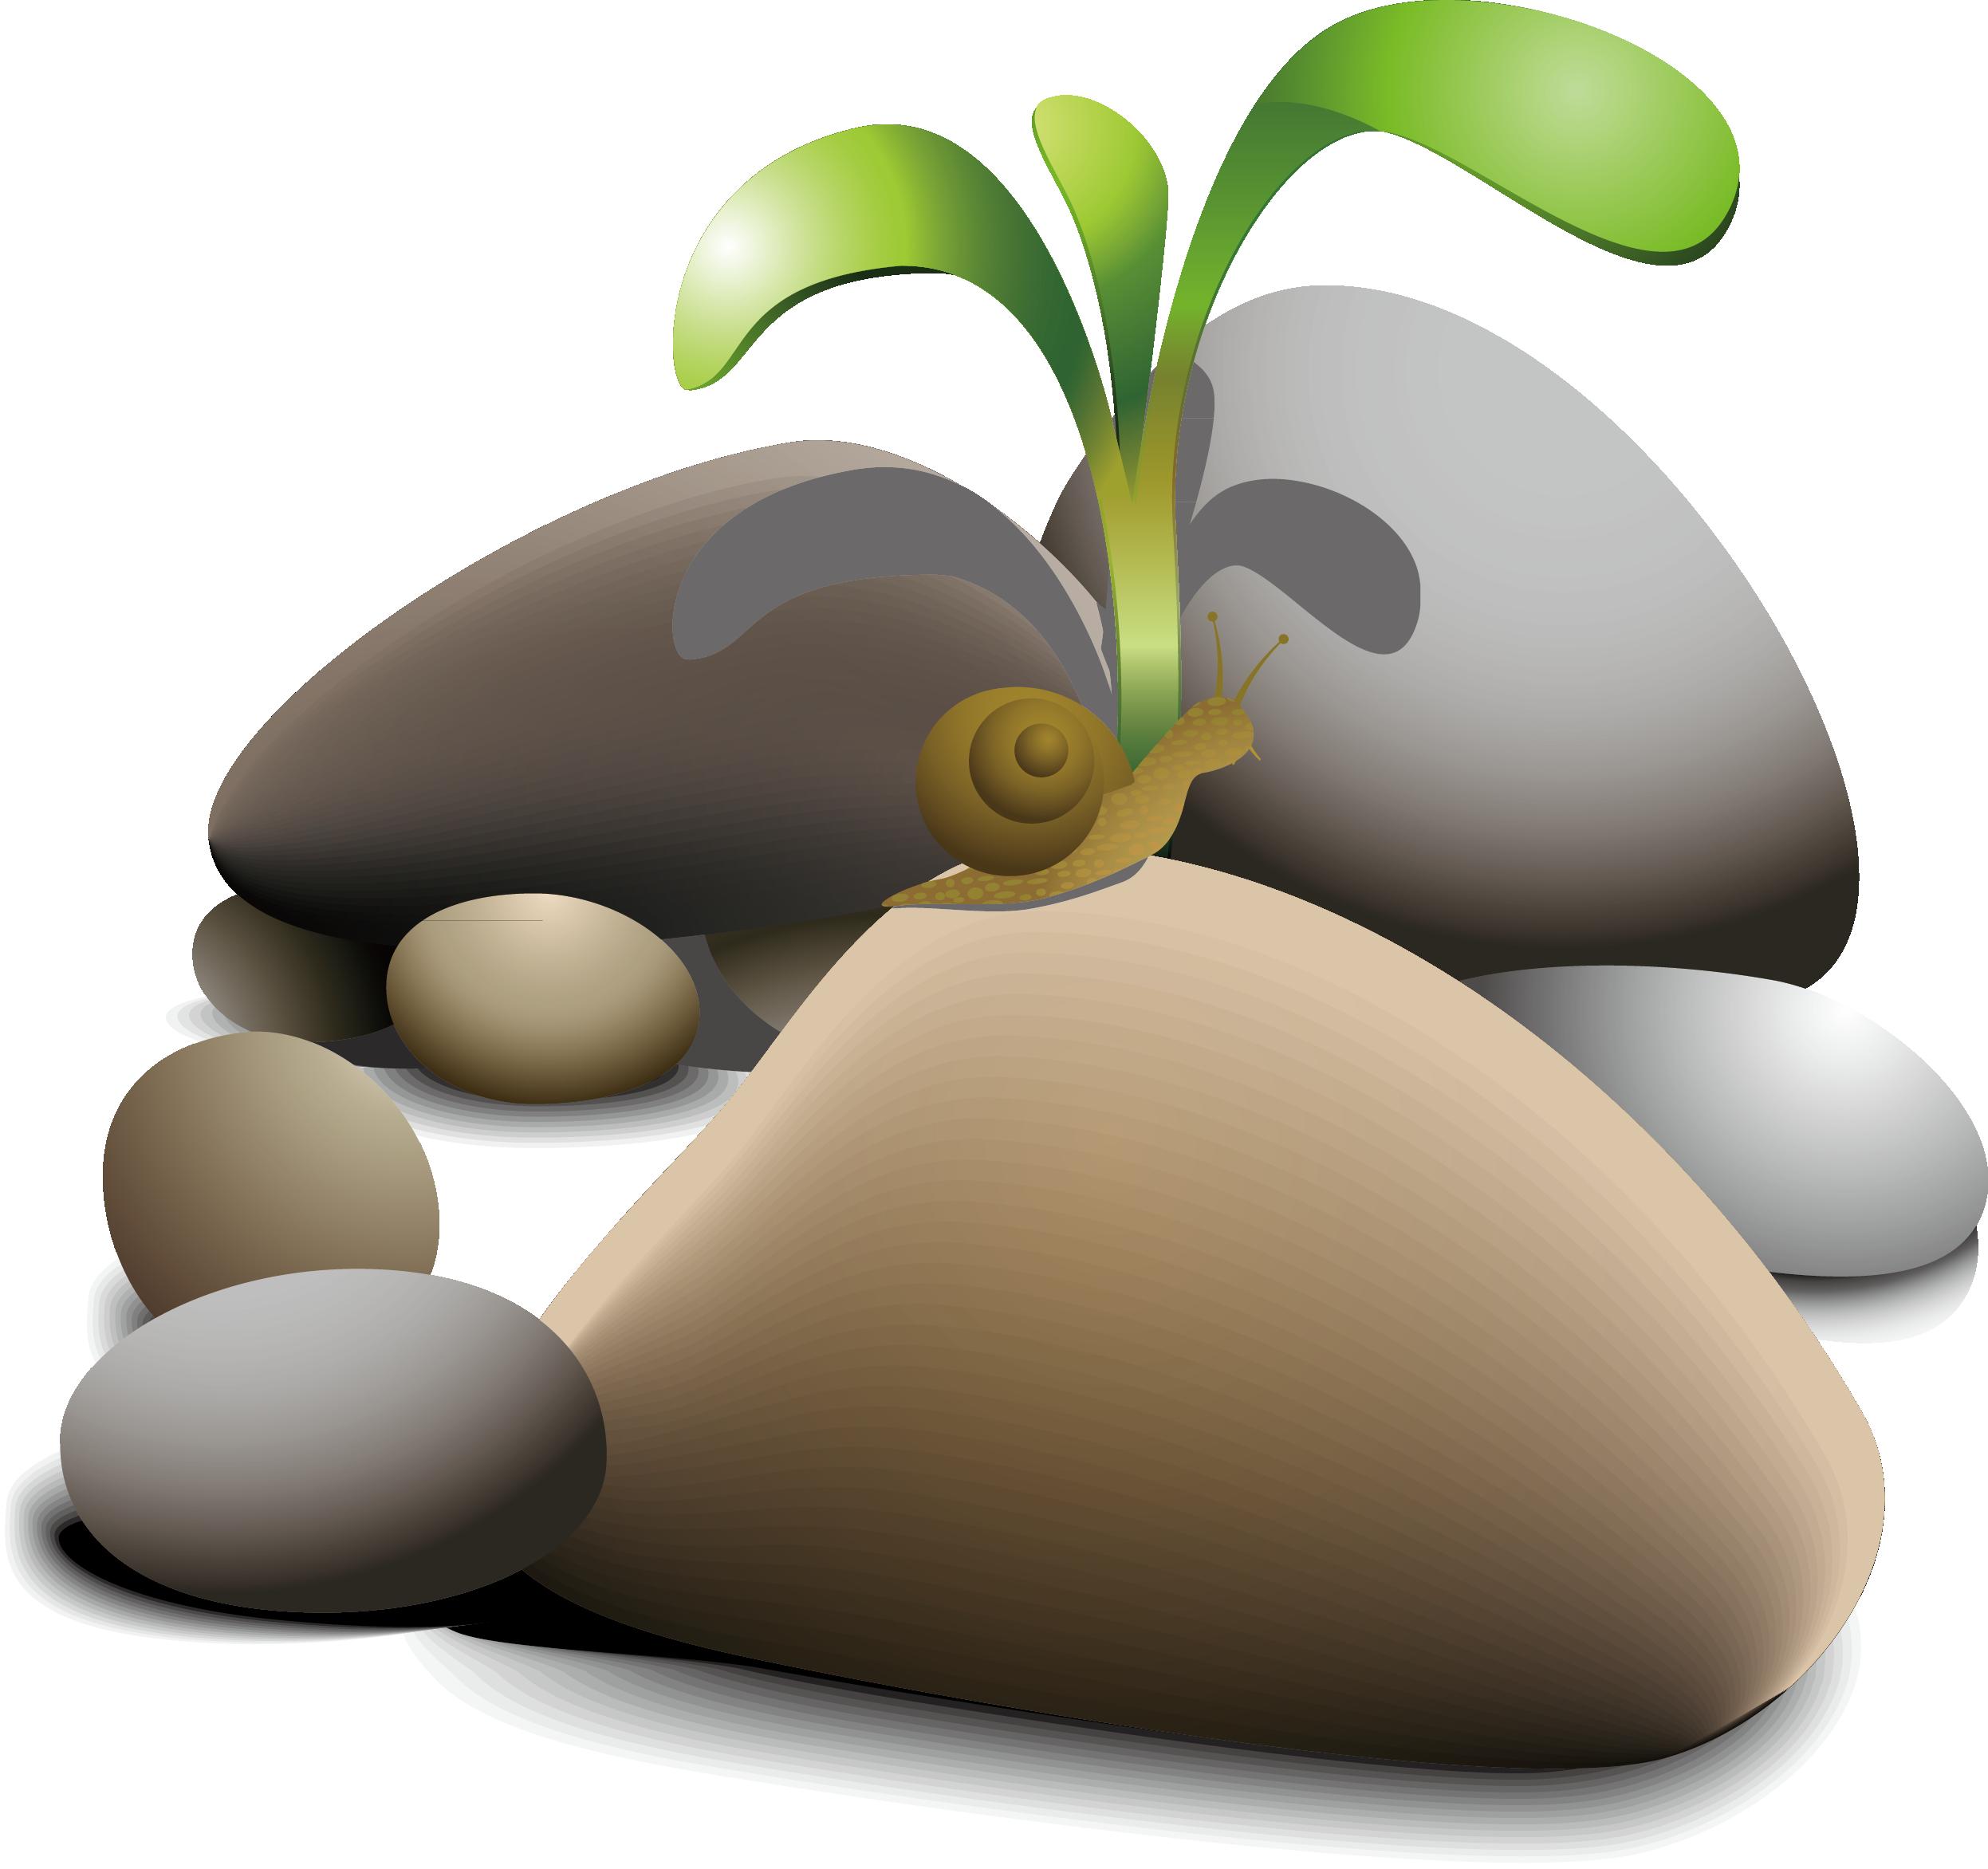 banner library download Rock Boulder Pebble Clip art